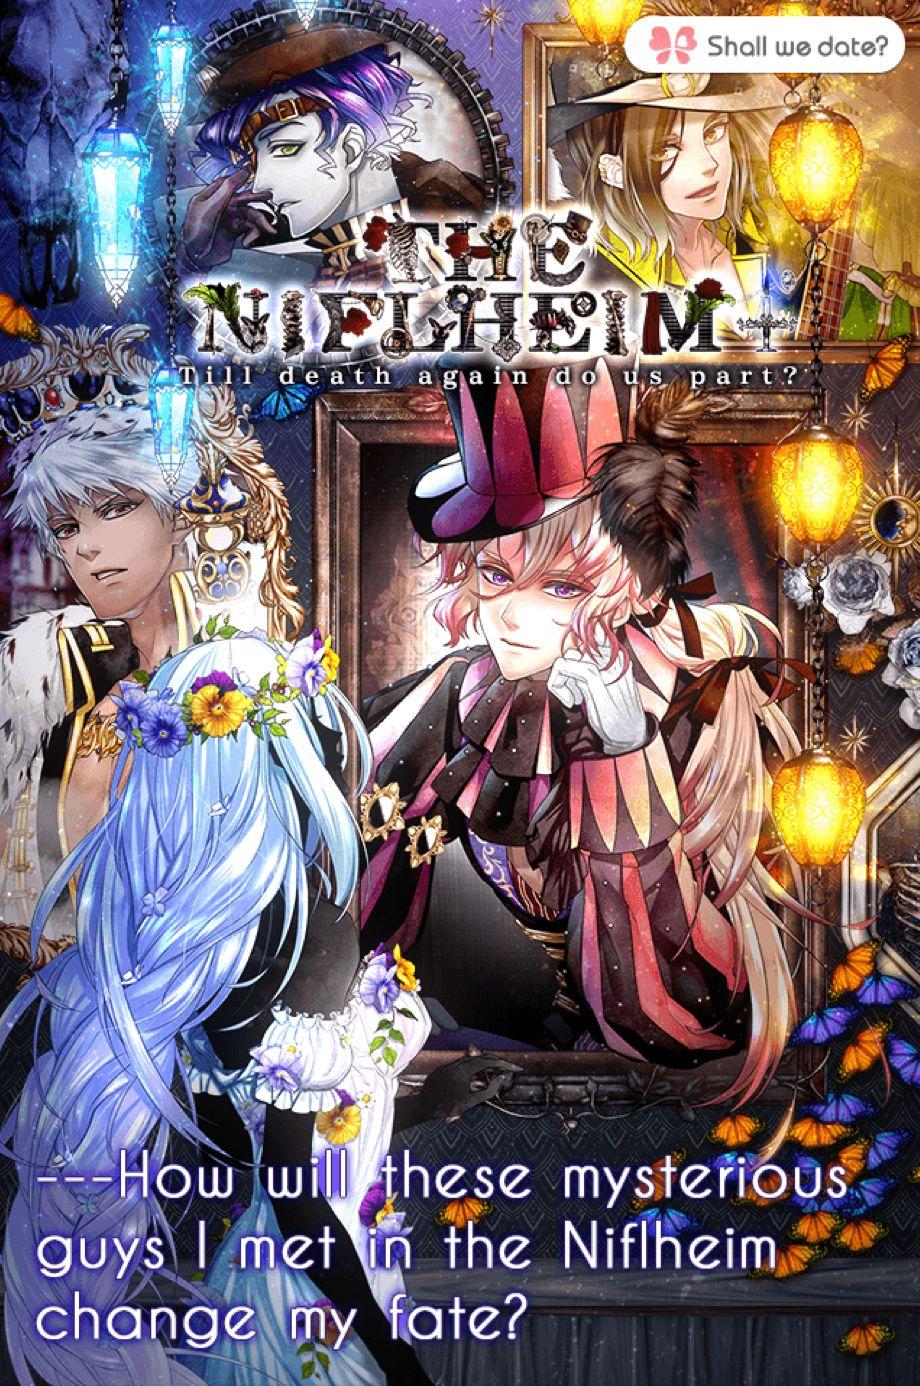 shall we date the niflheim